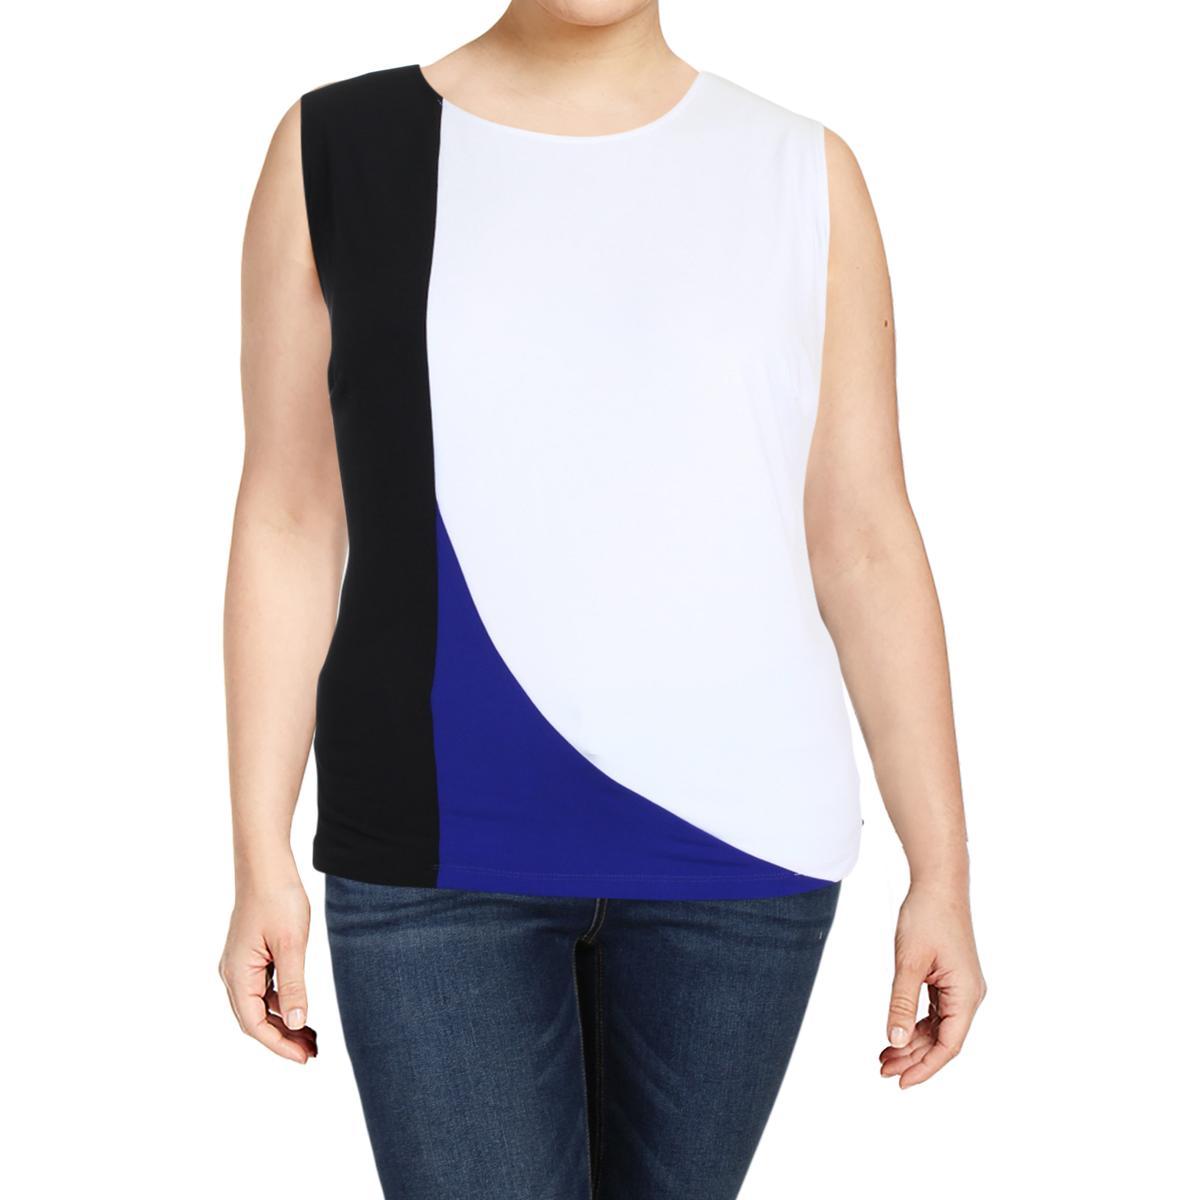 89a0ddad17a539 Details about Calvin Klein Womens Colorblock Sleeveless Crewneck Tank Top  Shirt Plus BHFO 1767